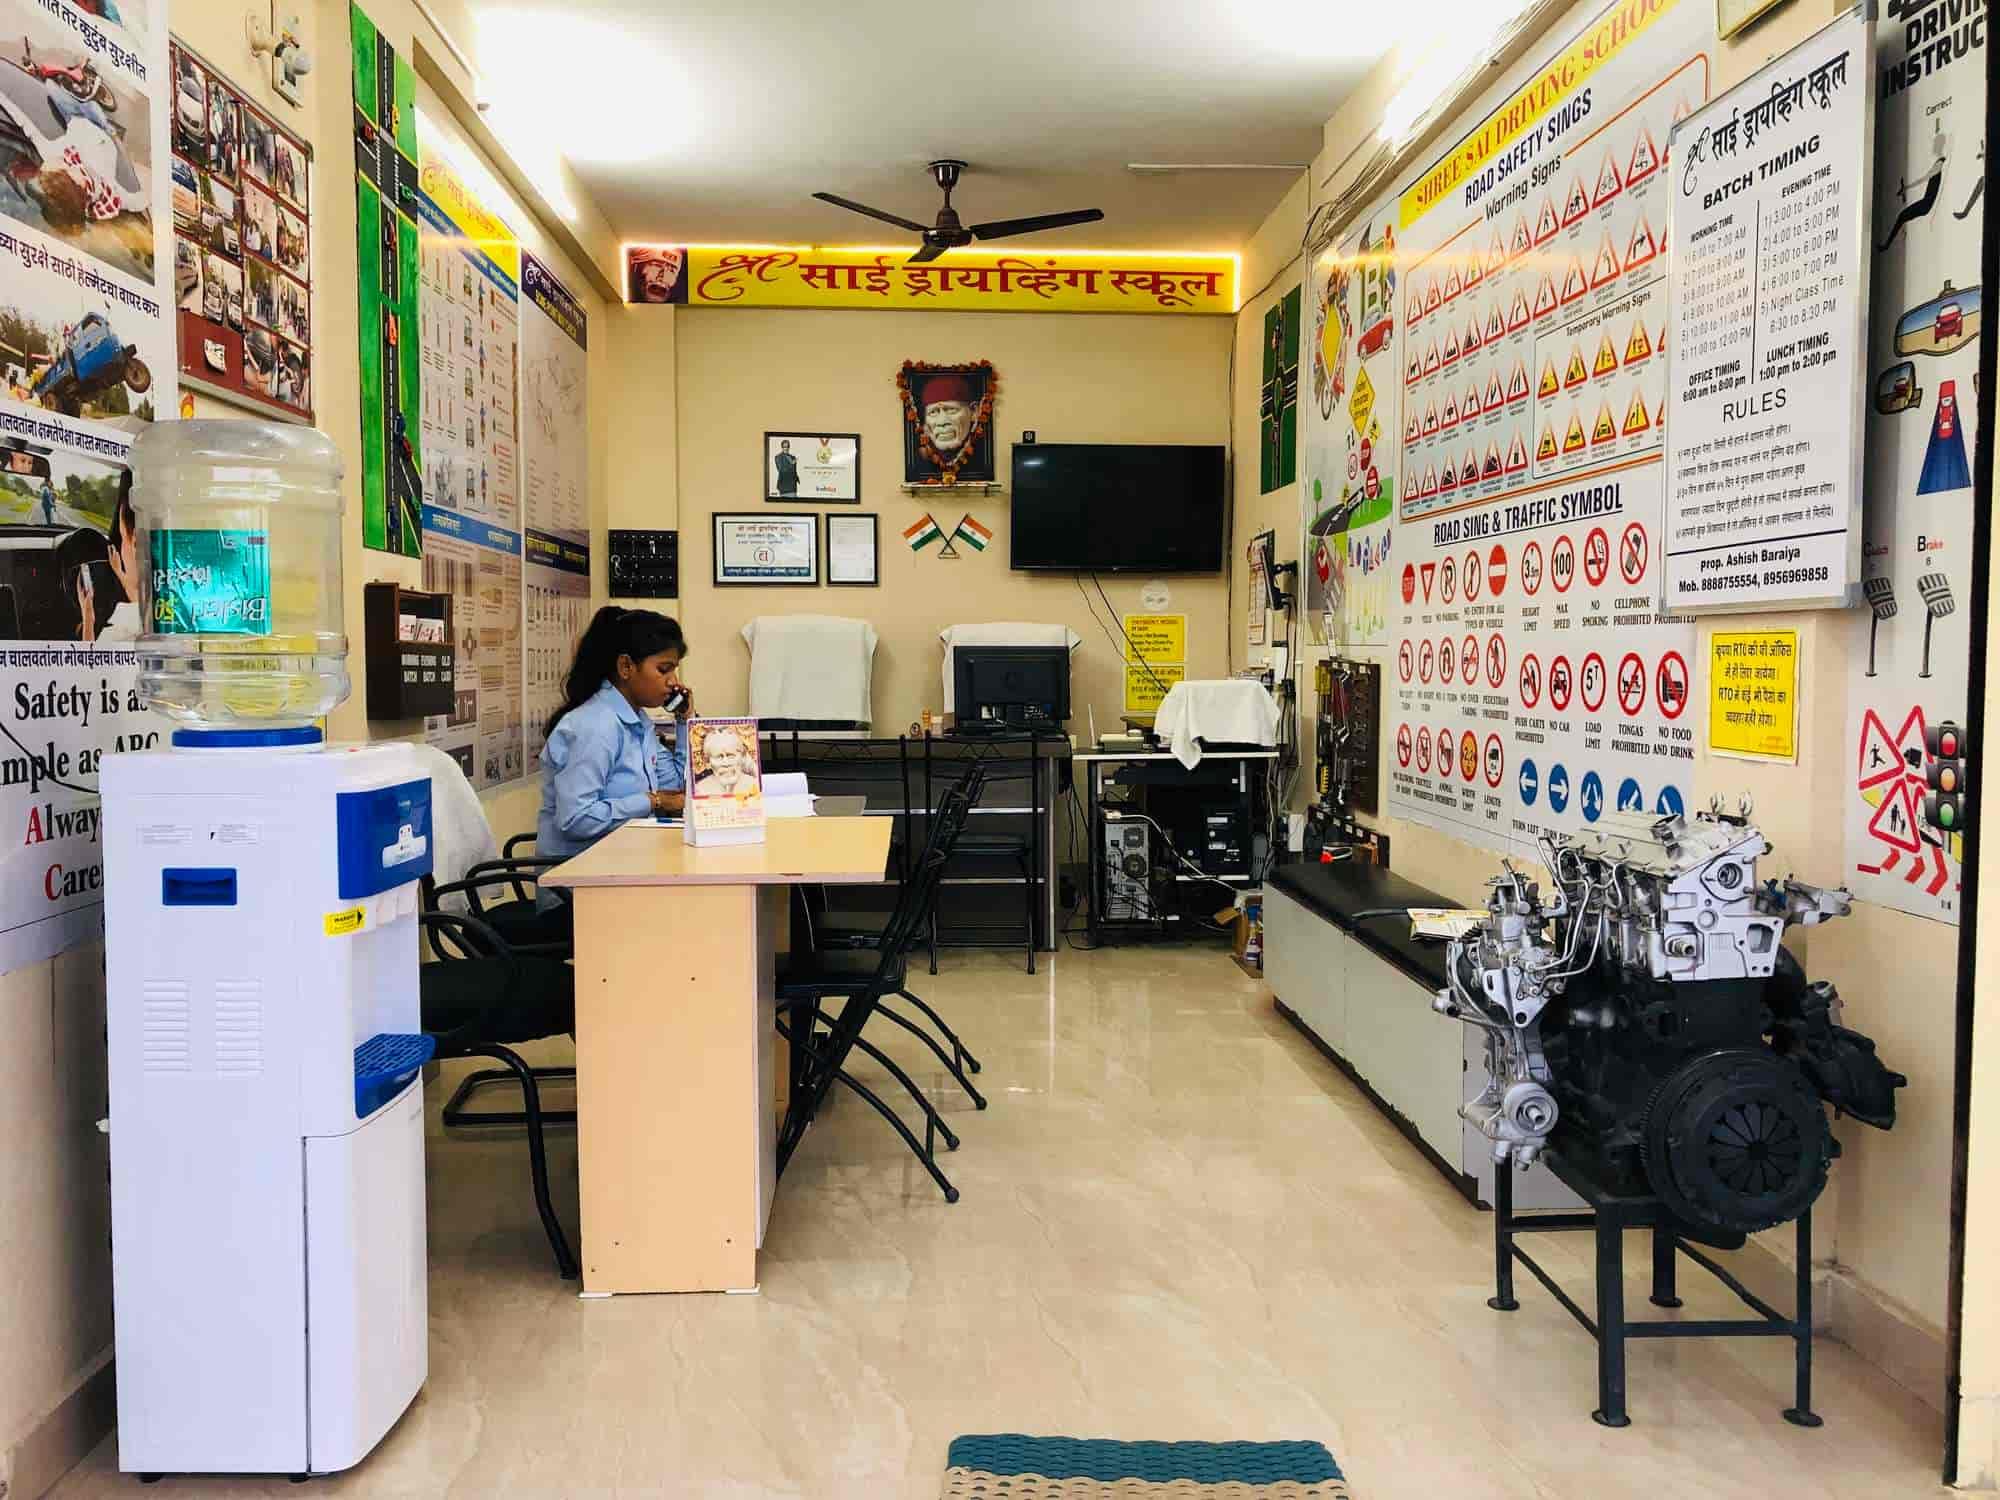 - Shree Sai Driving School Images, Dighori, Nagpur - Motor Training Schools